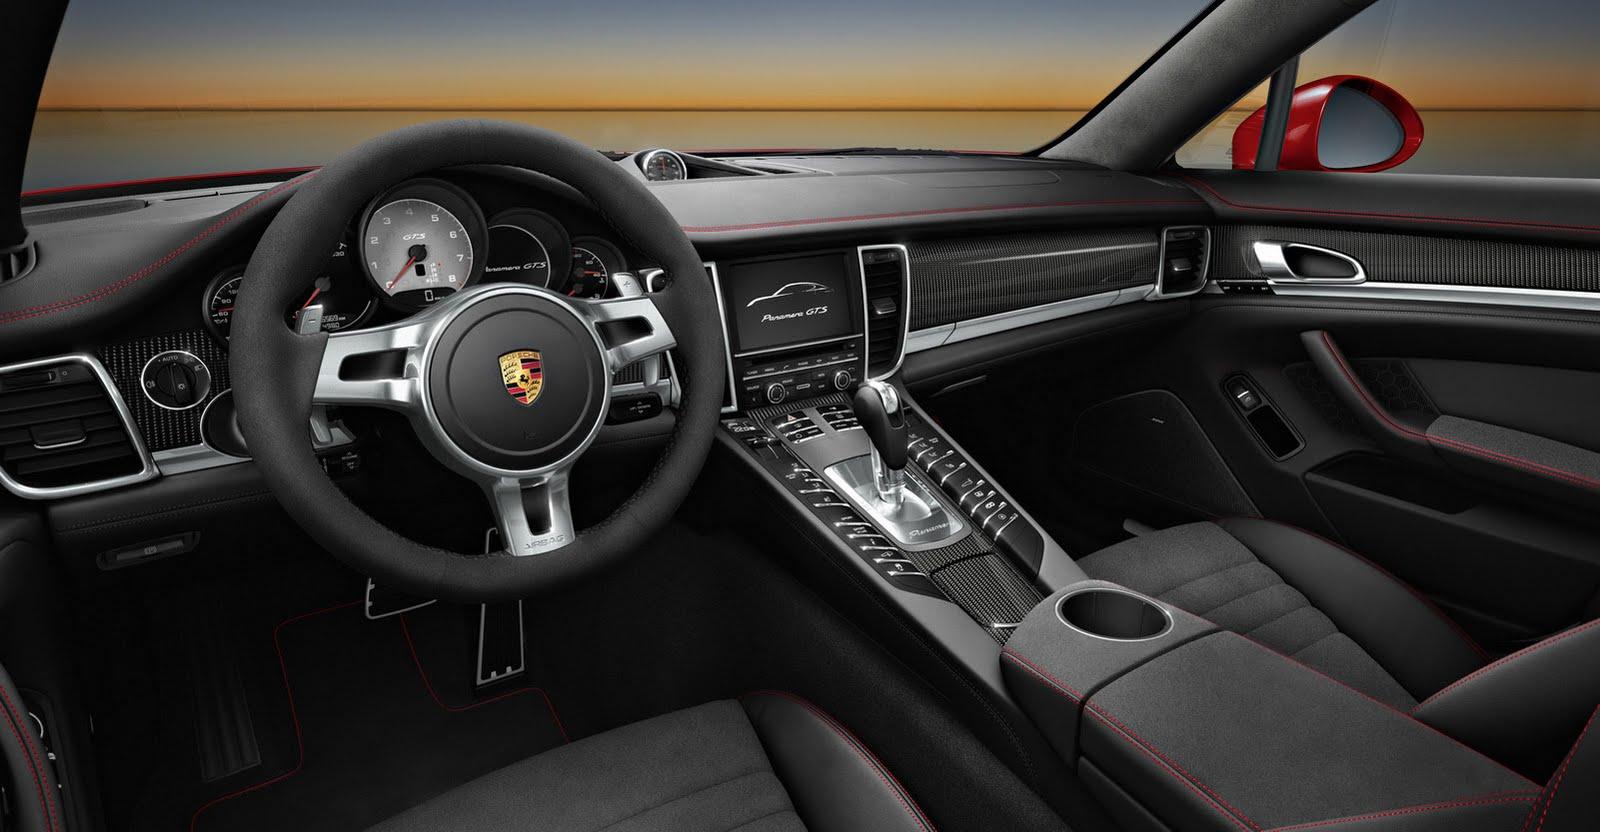 panamera porsche gts interior inside auto la autoevolution debuts forcegt interioe luxury things carmin 4s debut